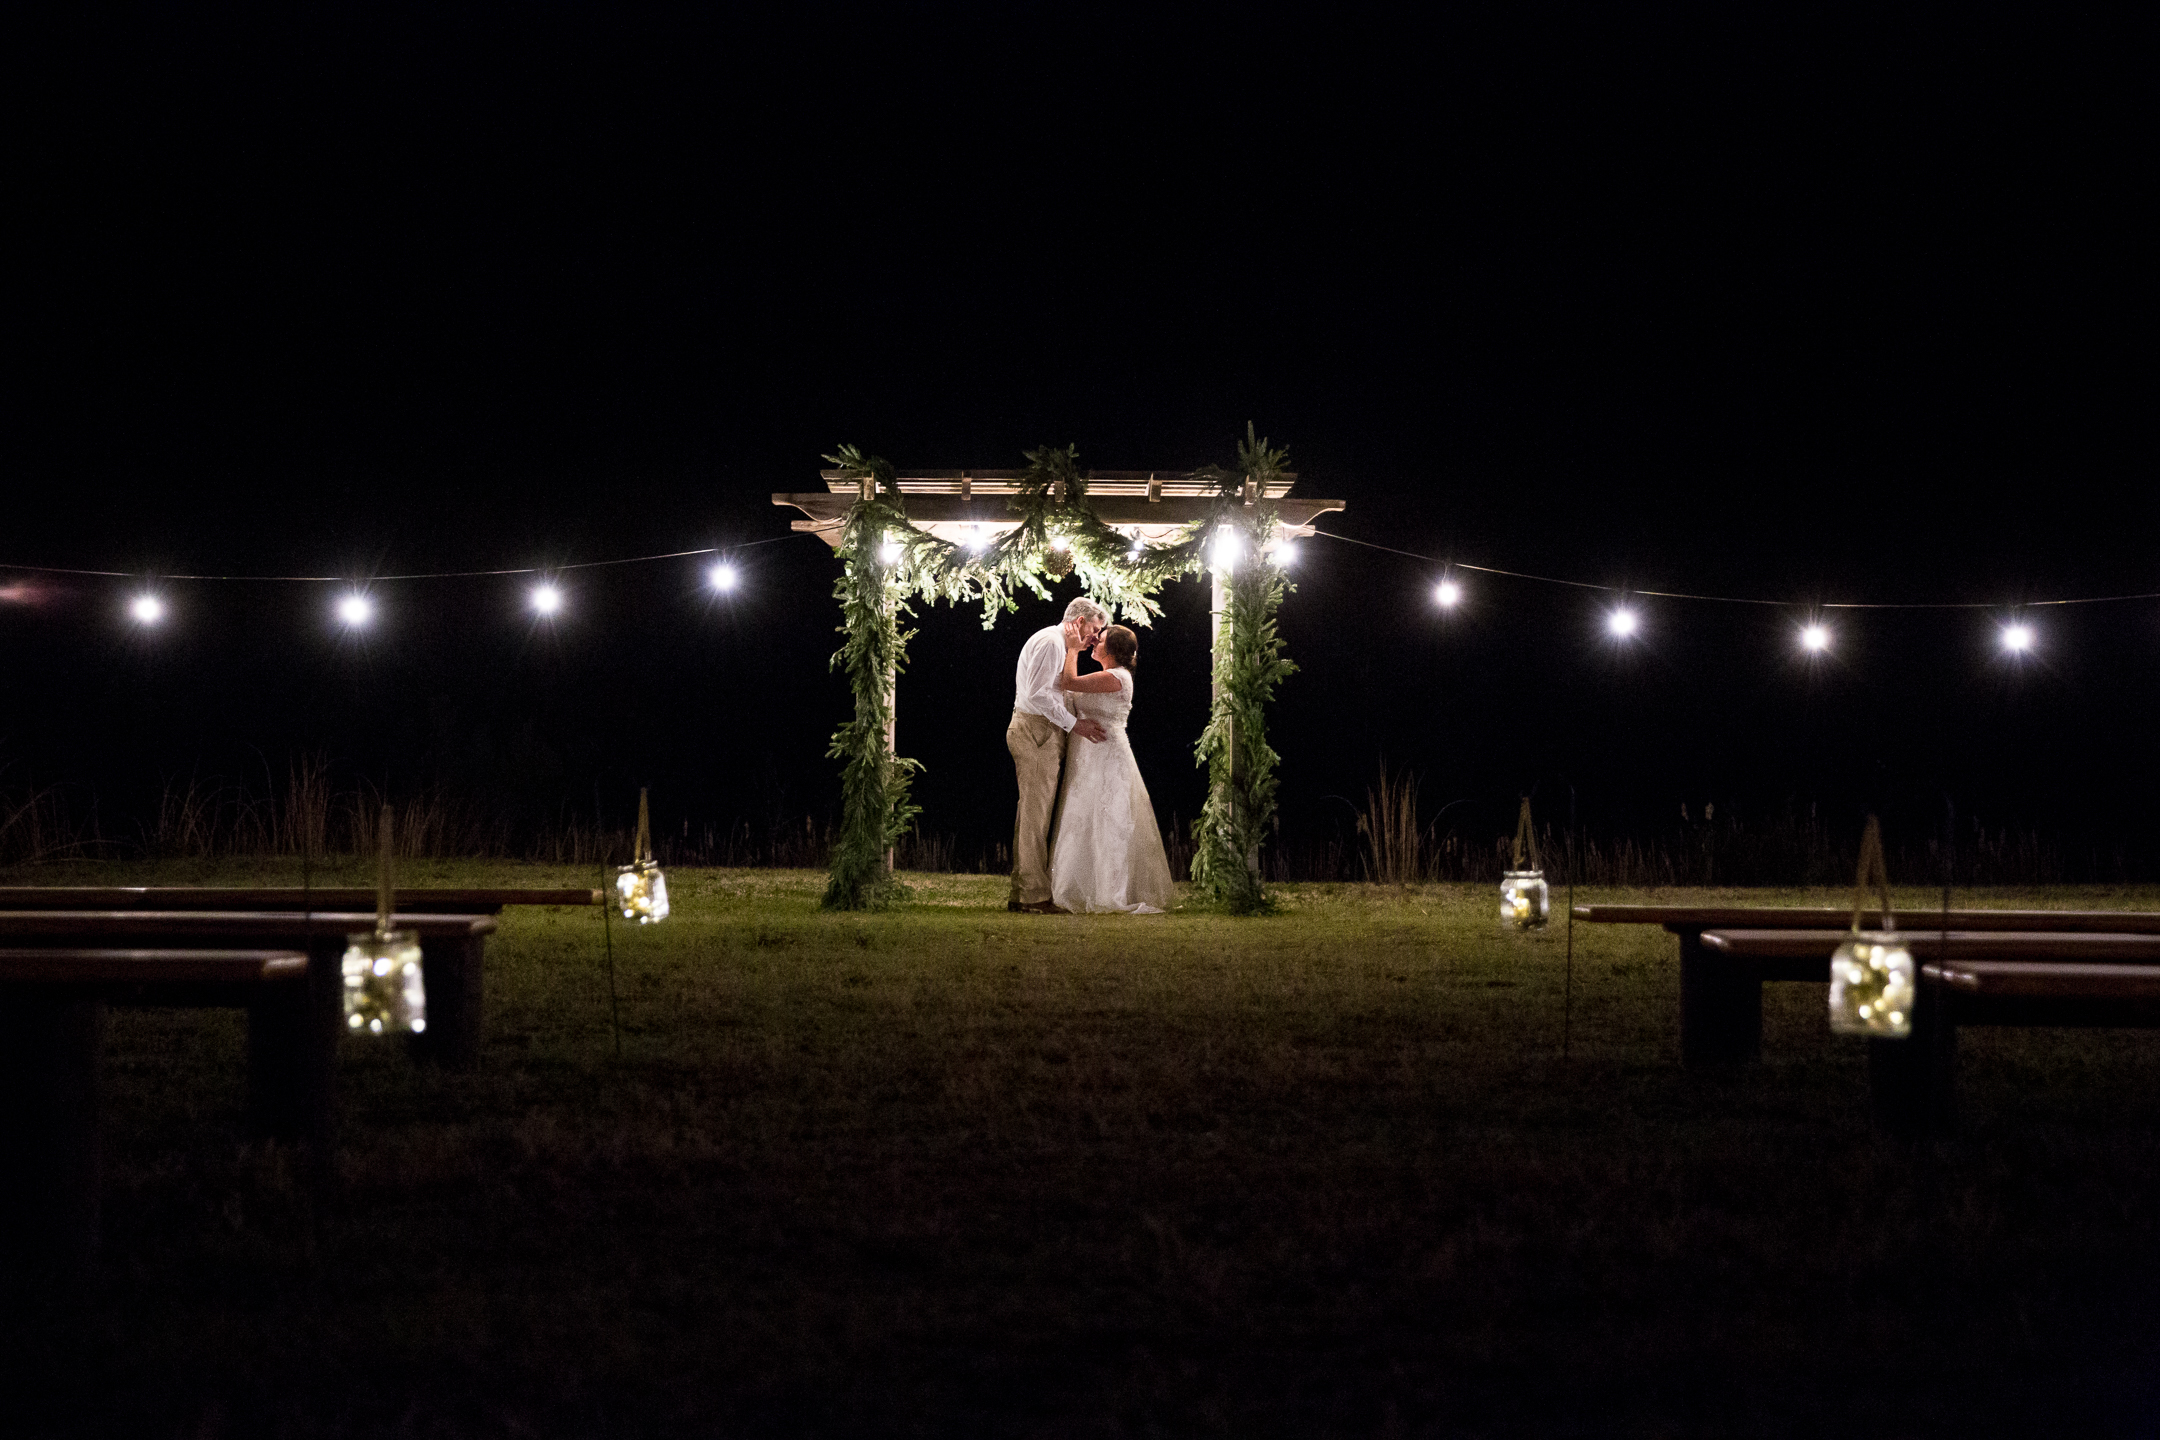 reception-lartz-wedding-dez-merrow-photograpy-331.jpg